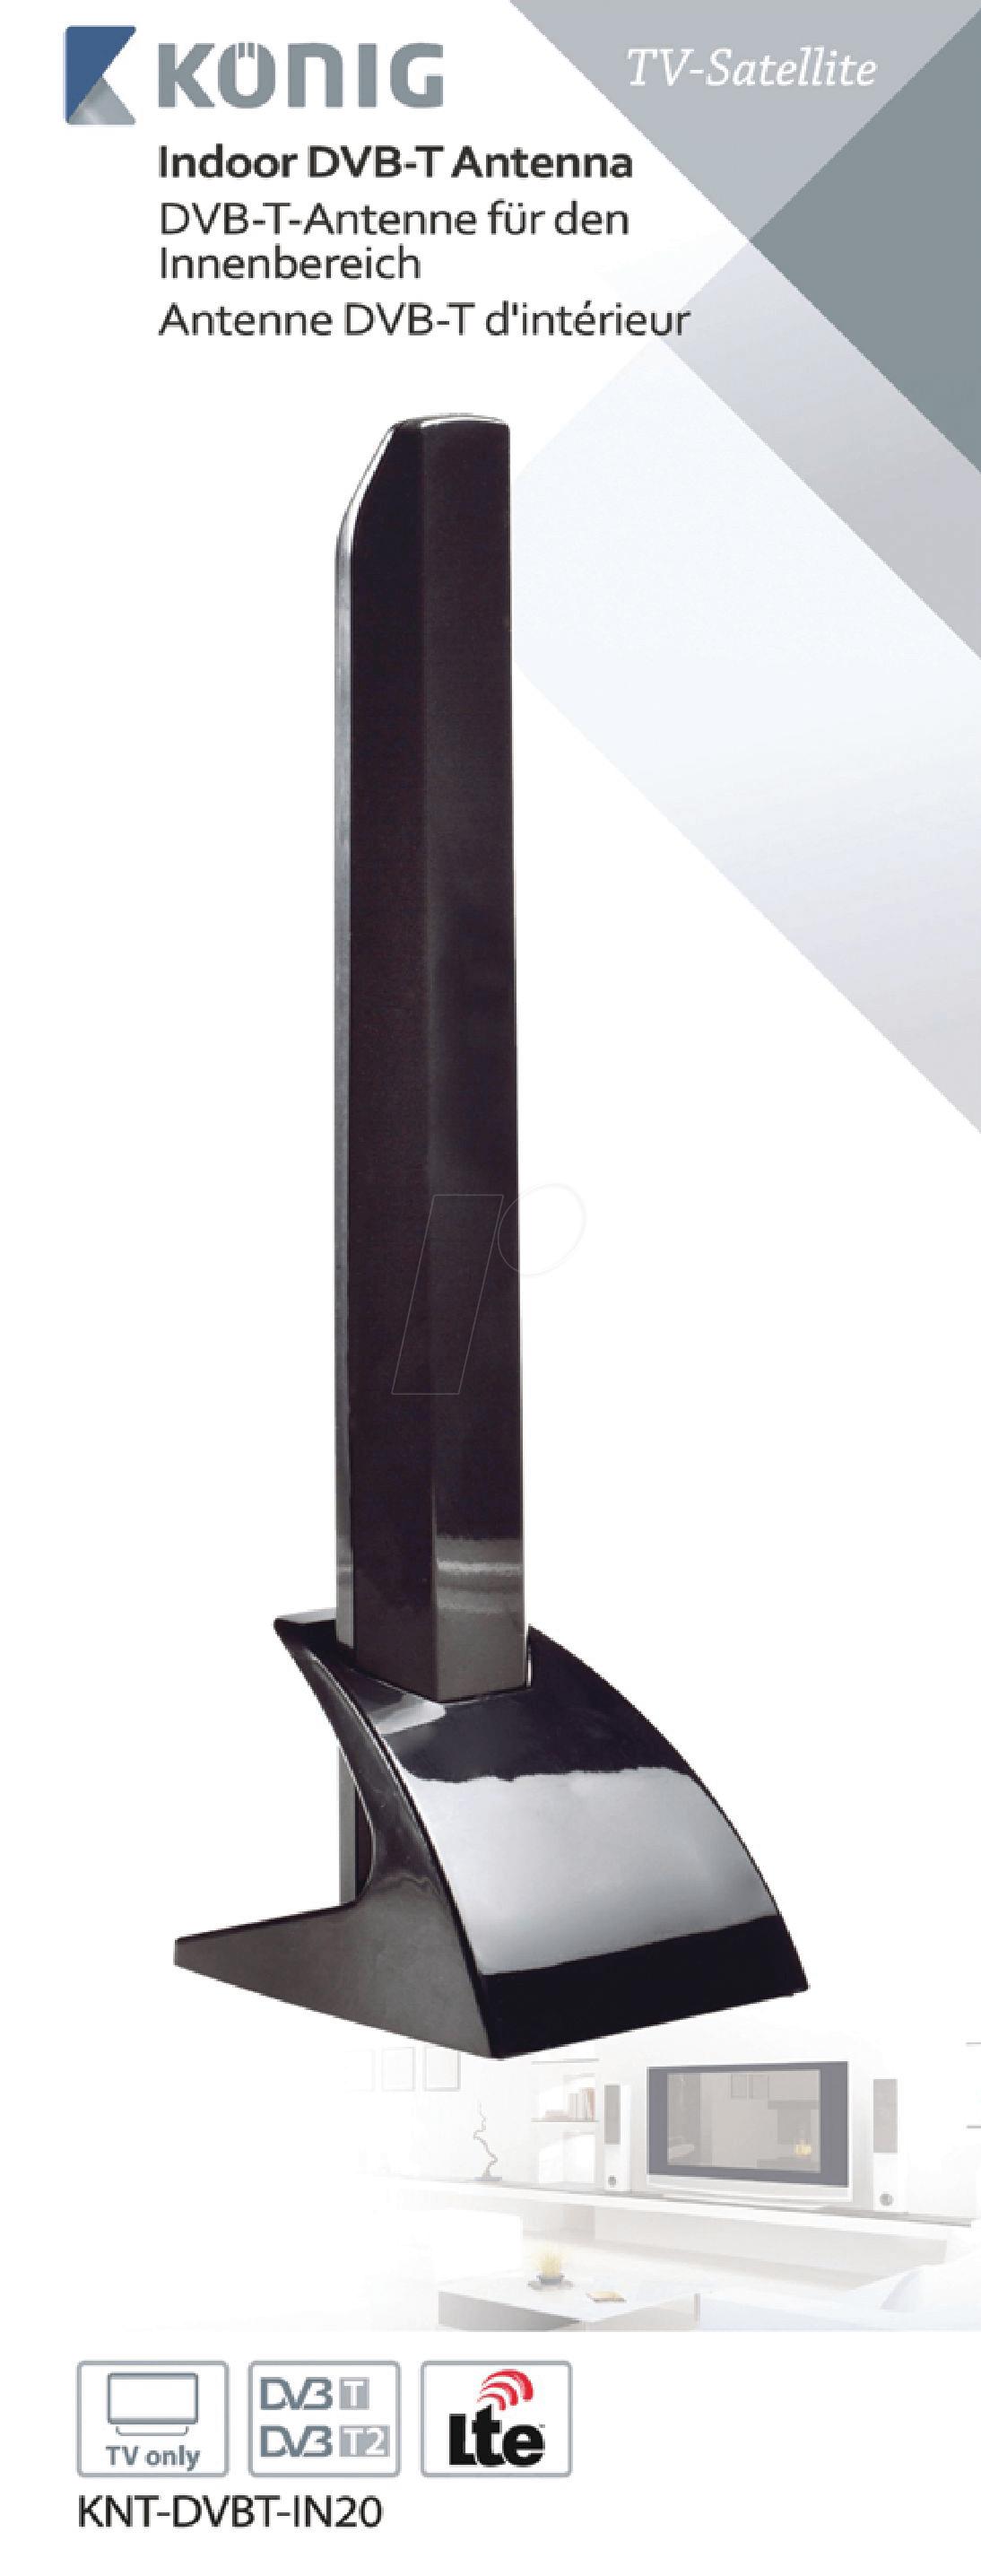 KNT-DVBT-IN20: DVB-T Antenne 15dB bei reichelt elektronik